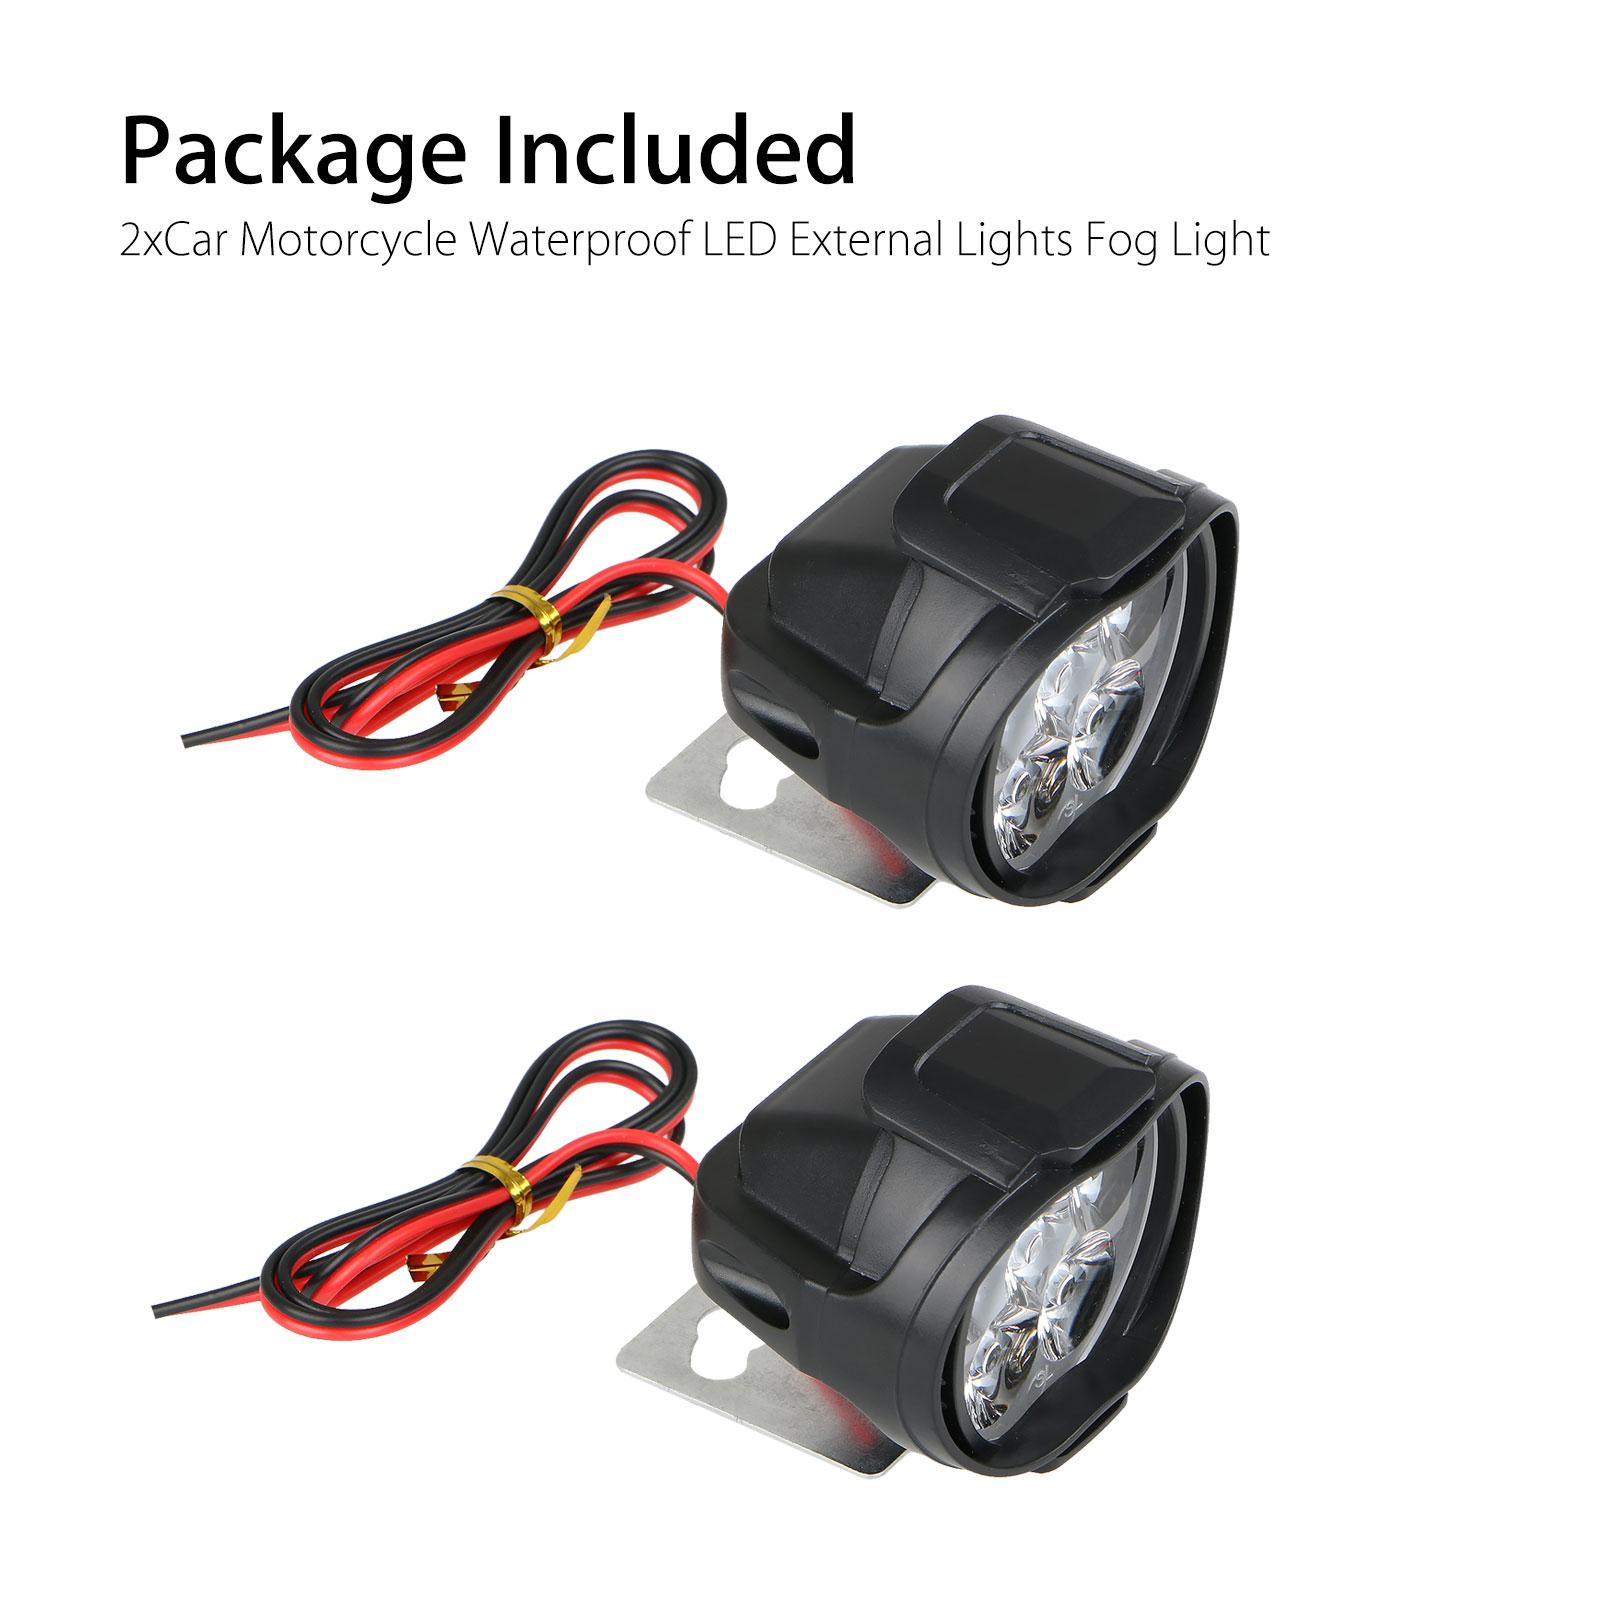 2Pcs-Universal-Car-SUV-Motorcycle-LED-Waterproof-Lights-Fog-Light-Headlight-Lamp thumbnail 8